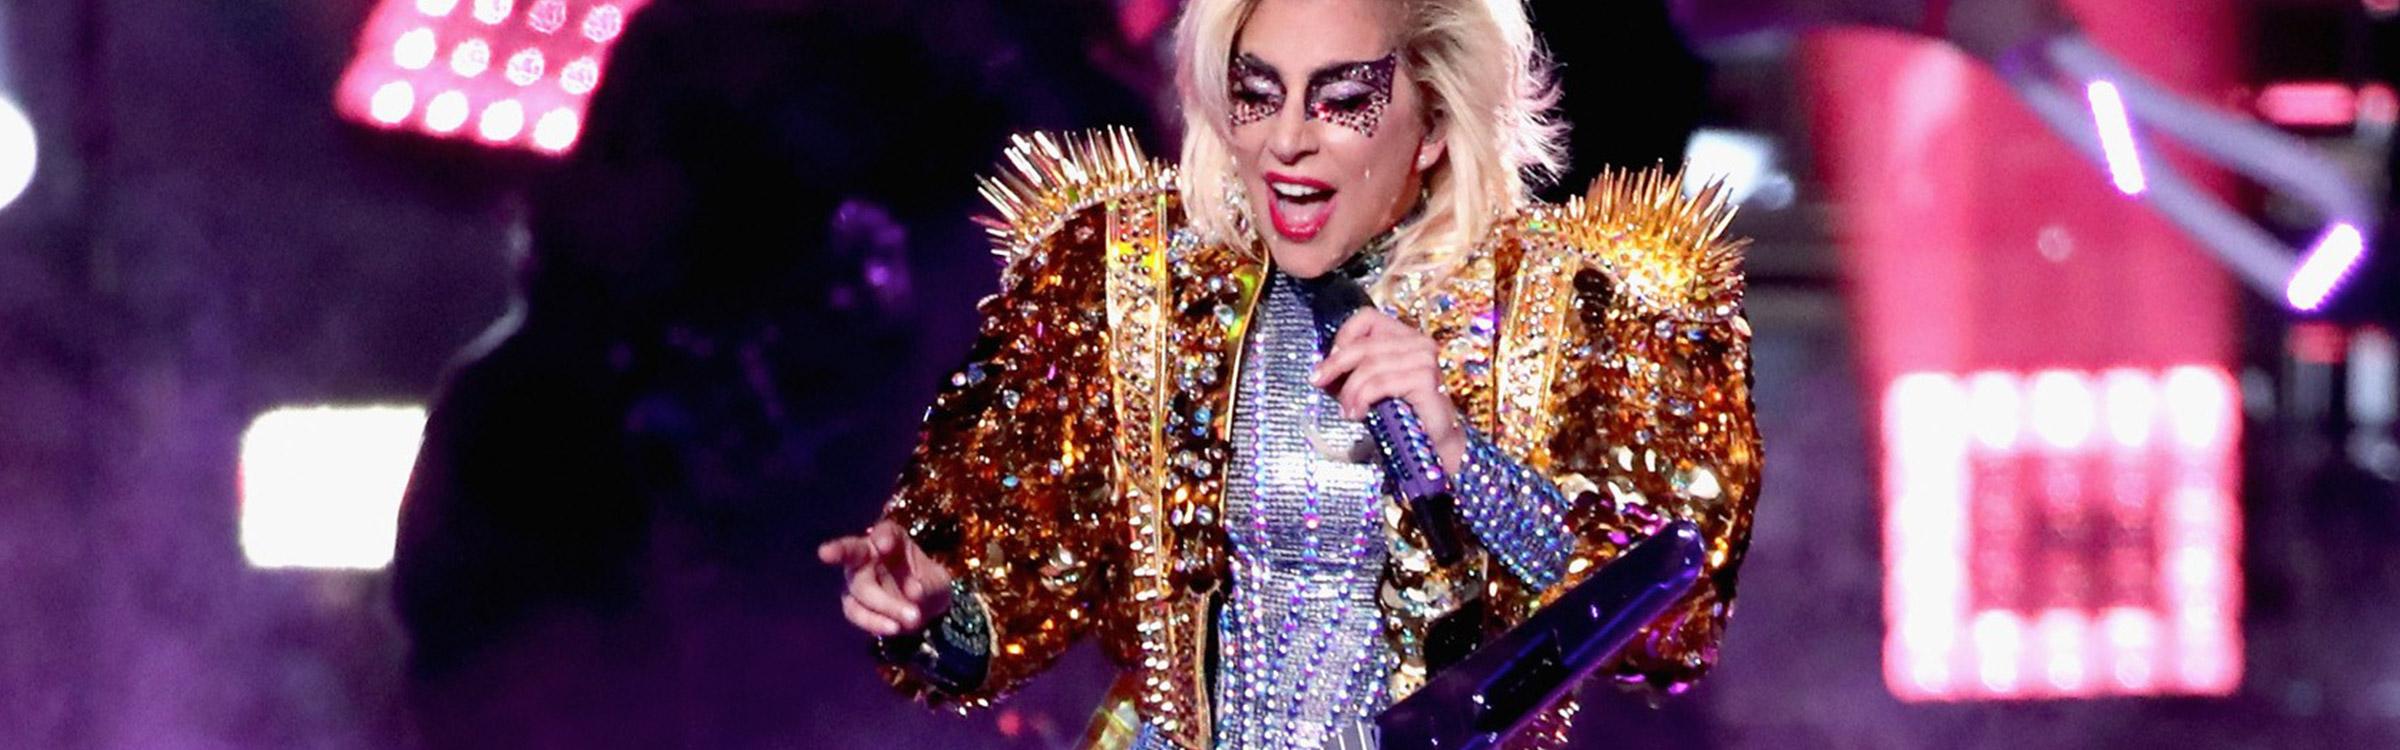 Gaga coachella header